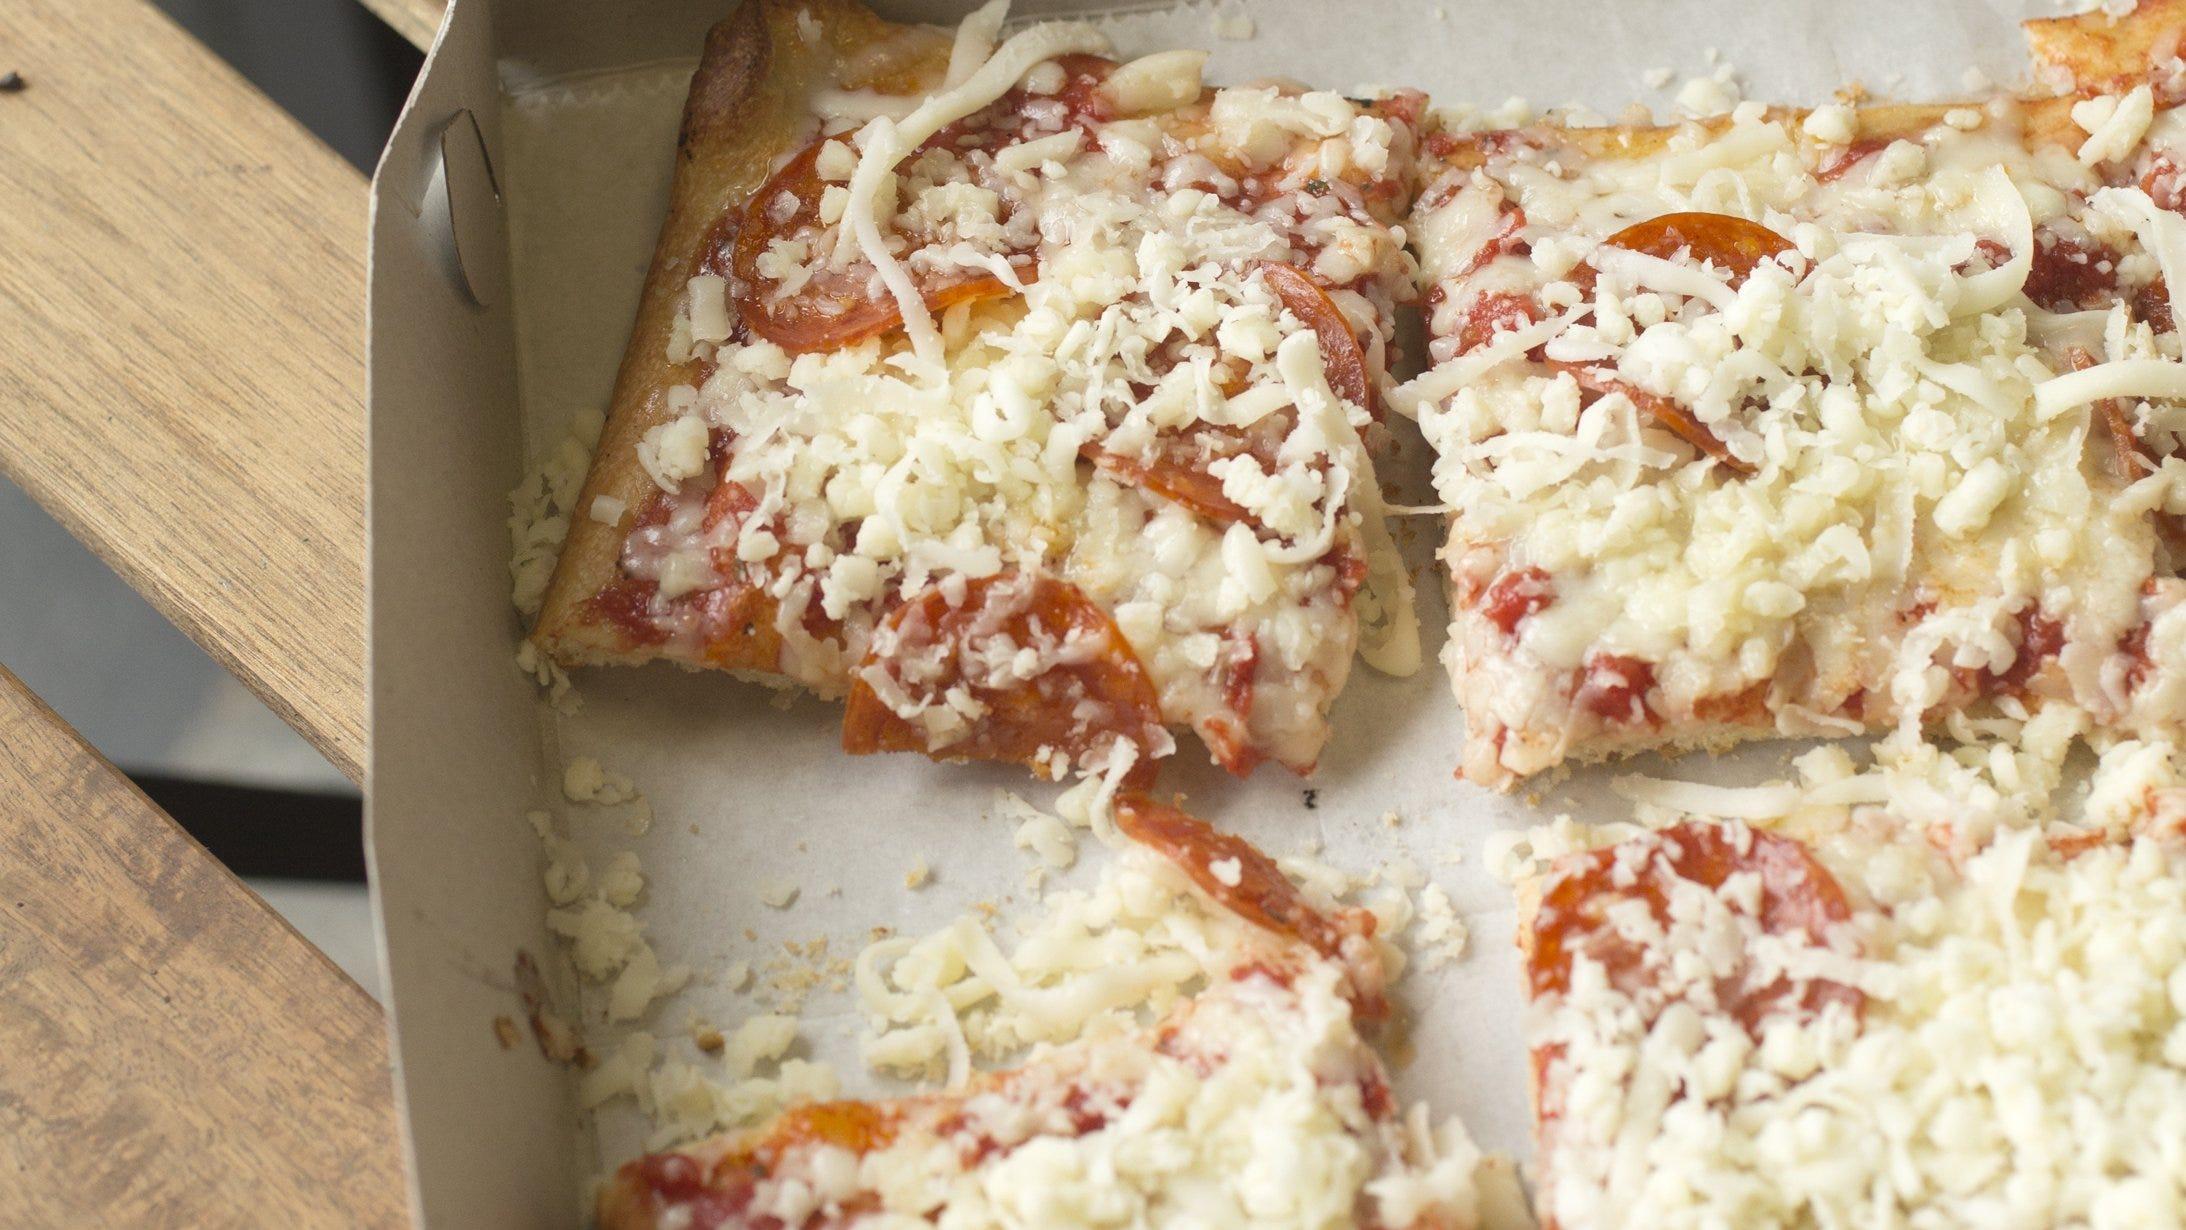 DiCarlo's brings Ohio Valley pizza to Italian Village